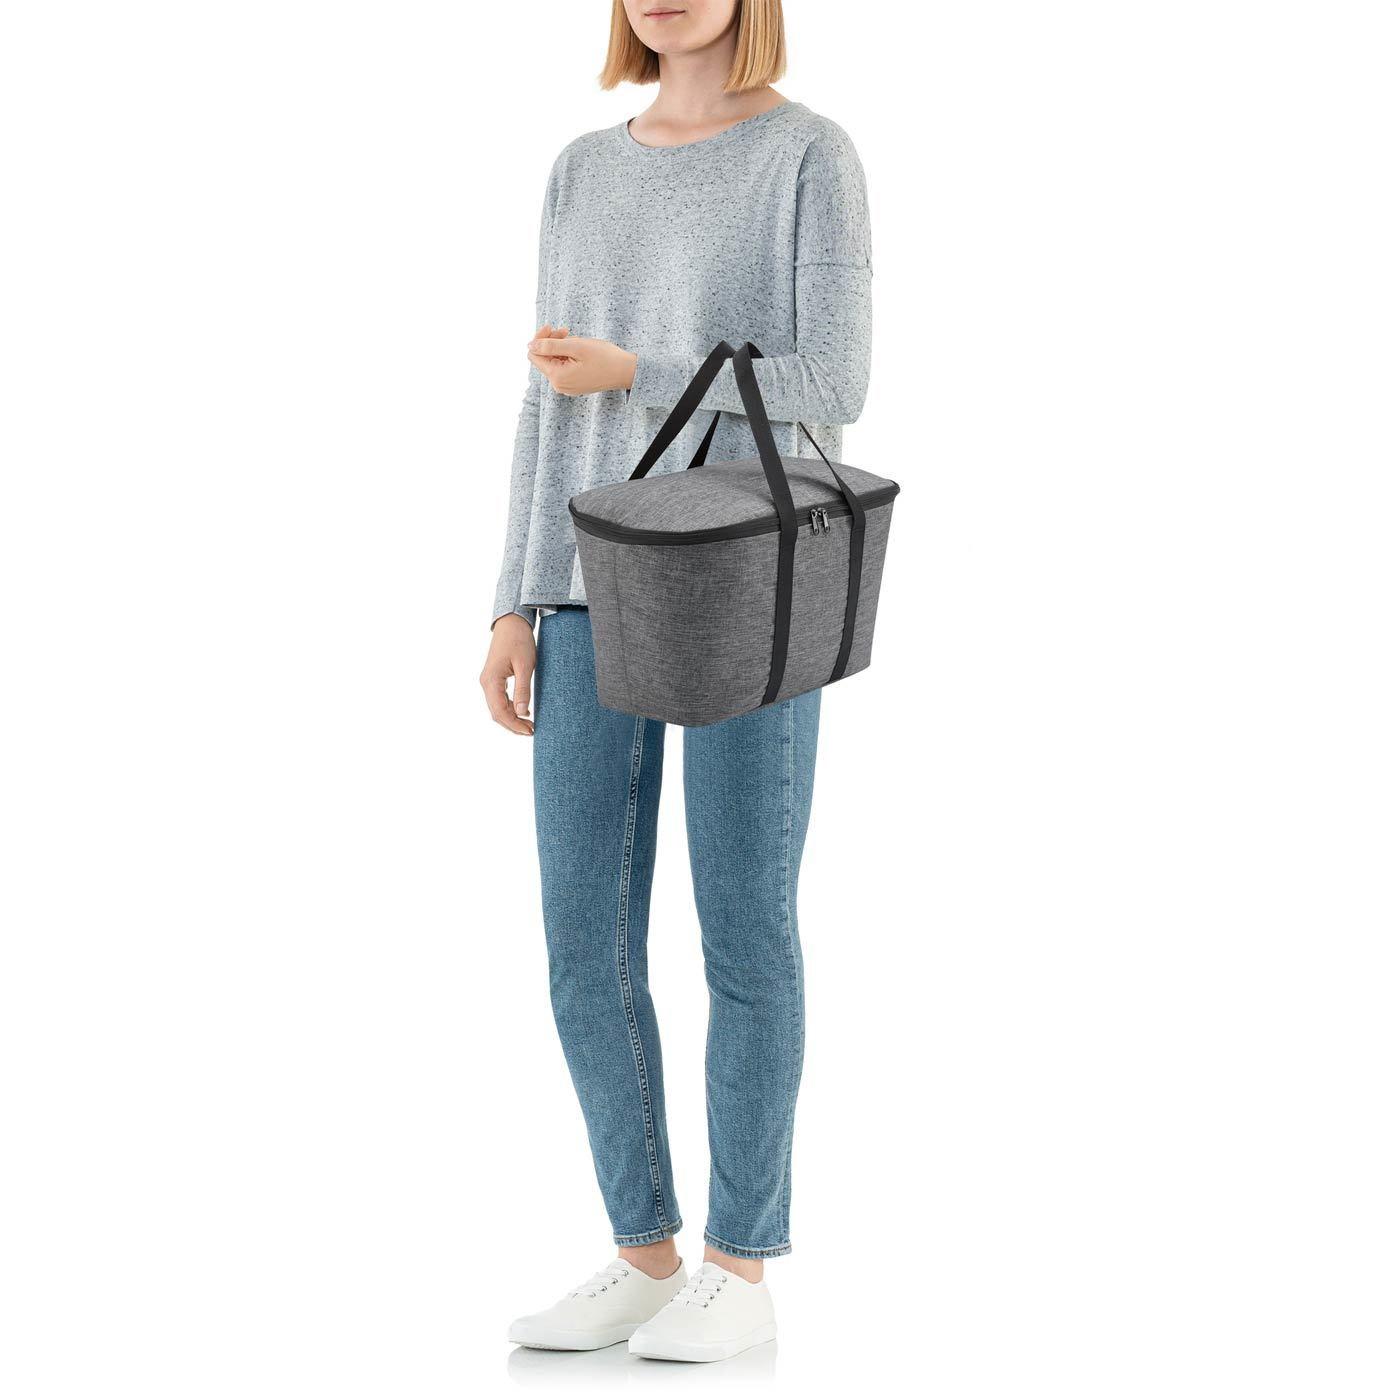 Termotaška Coolerbag twist silver_2